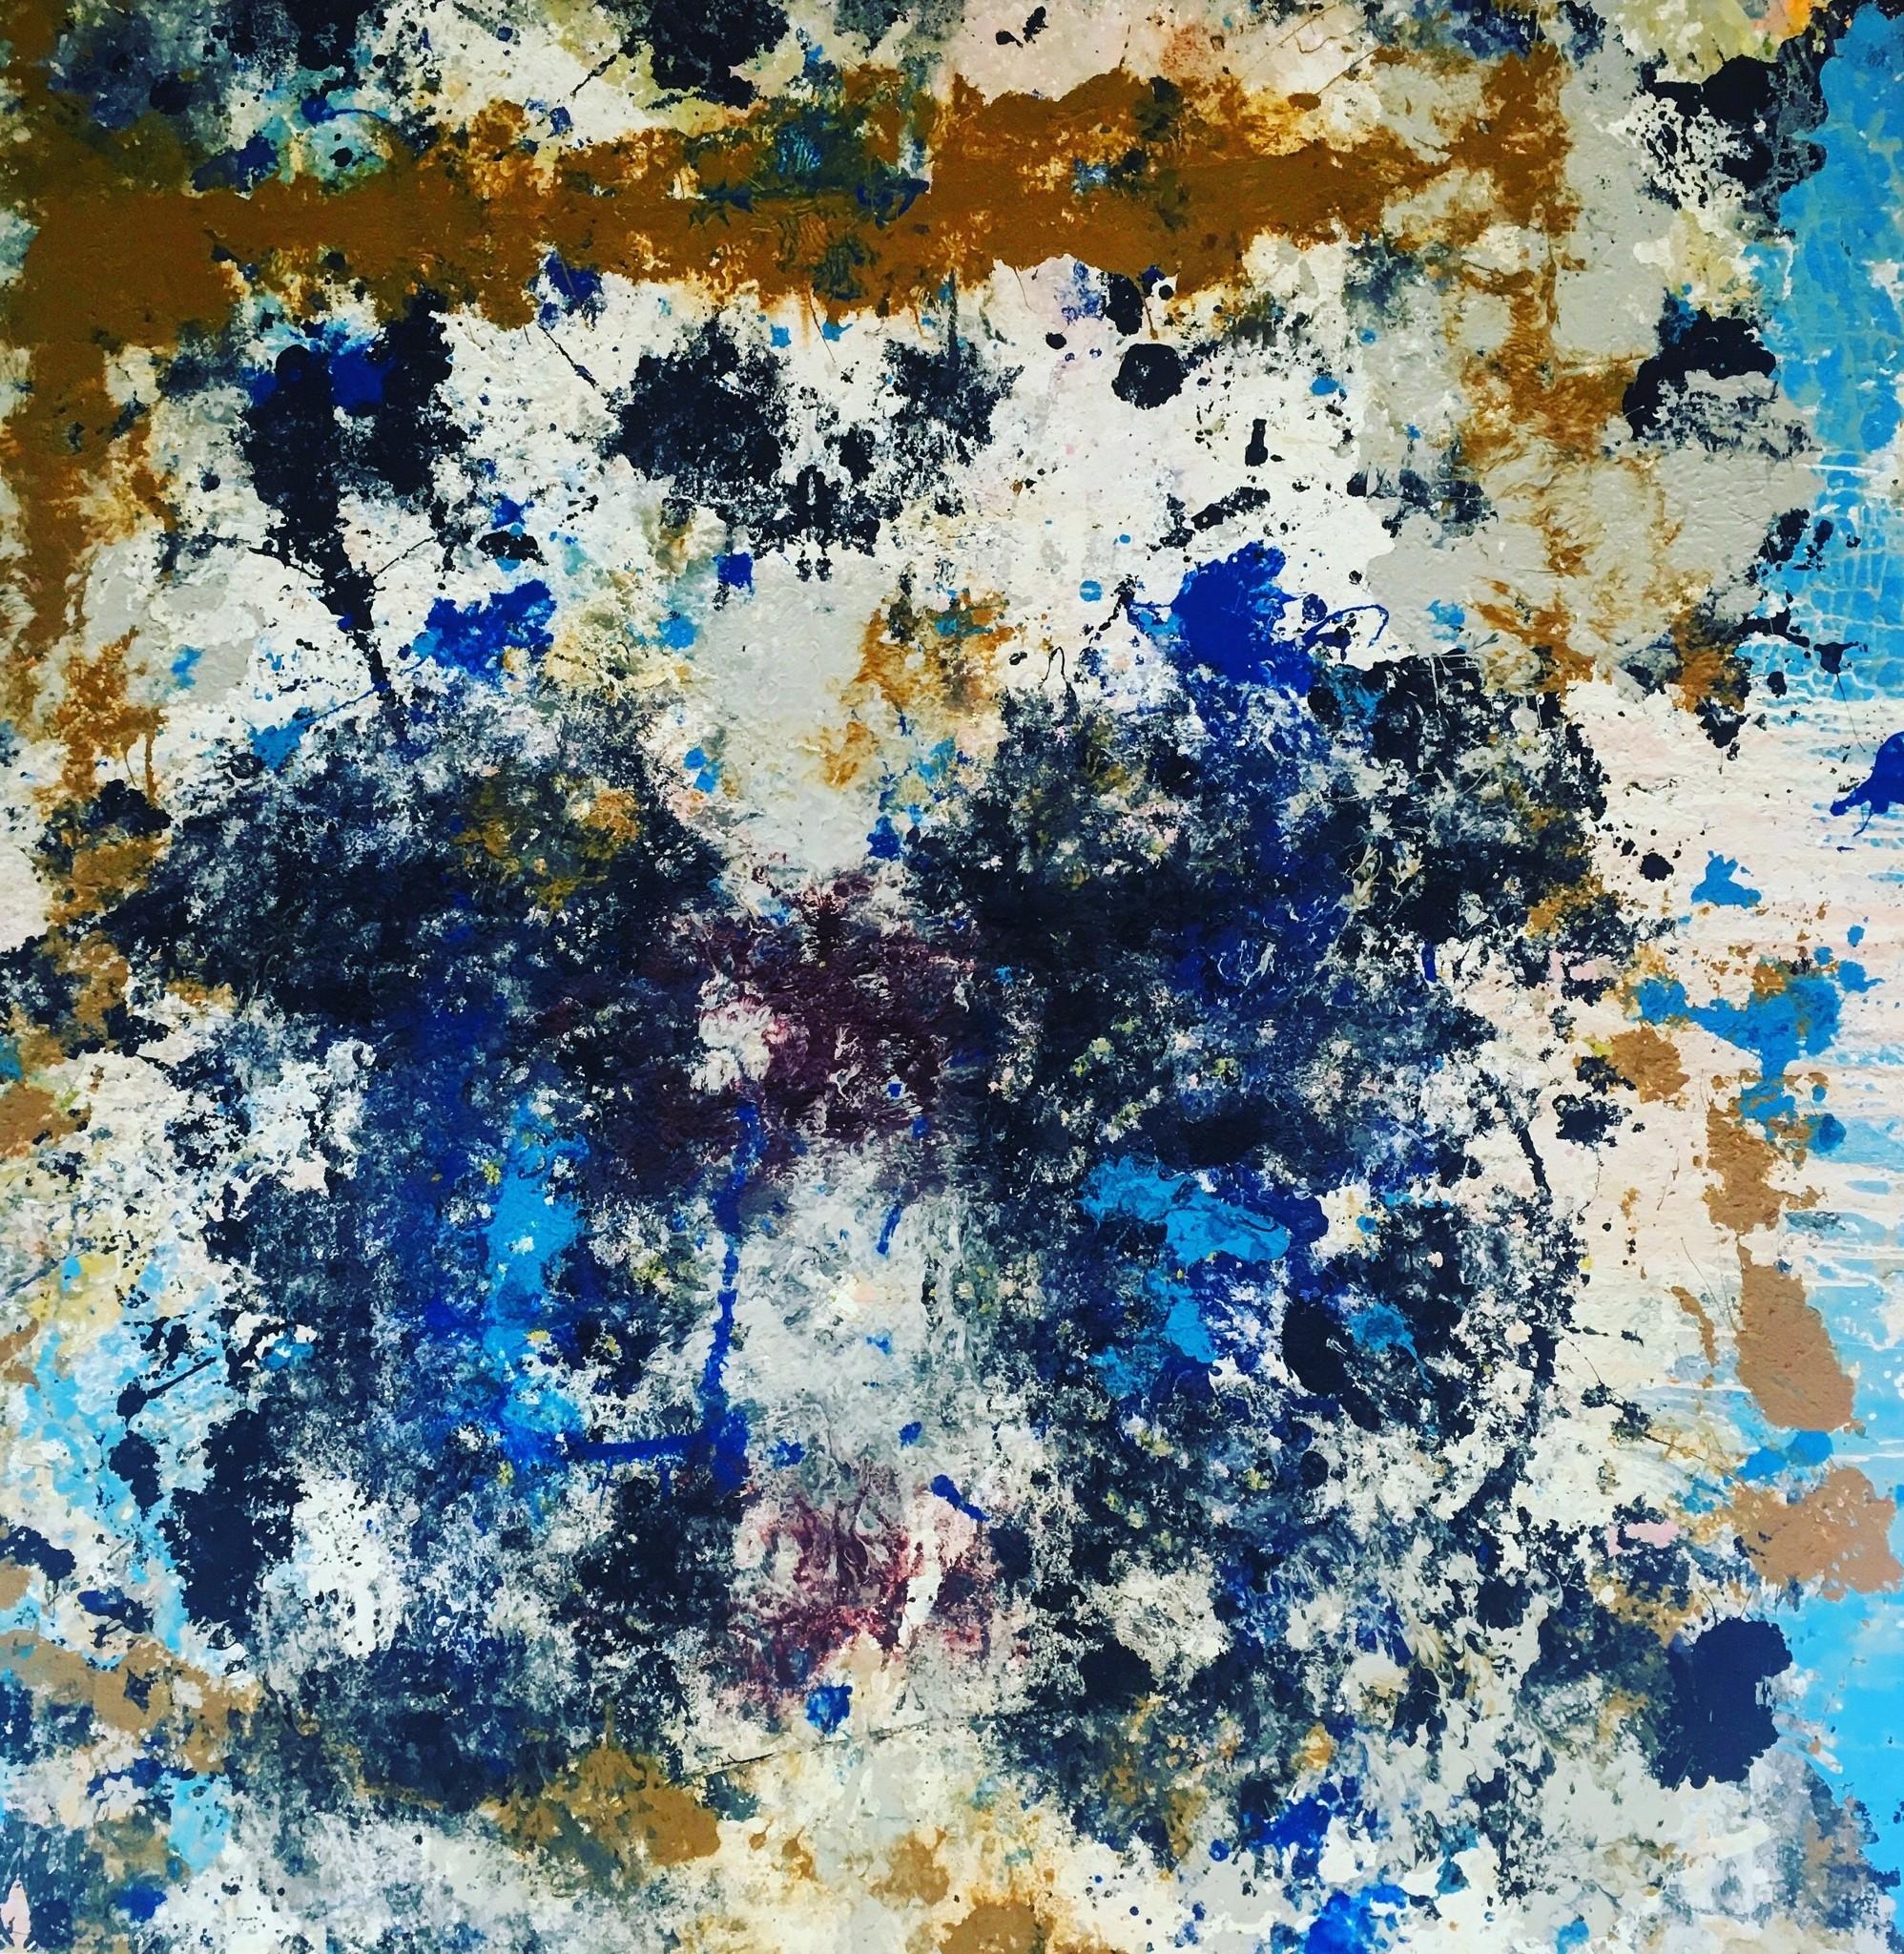 Imitation of Life (Blue Oh Blue)